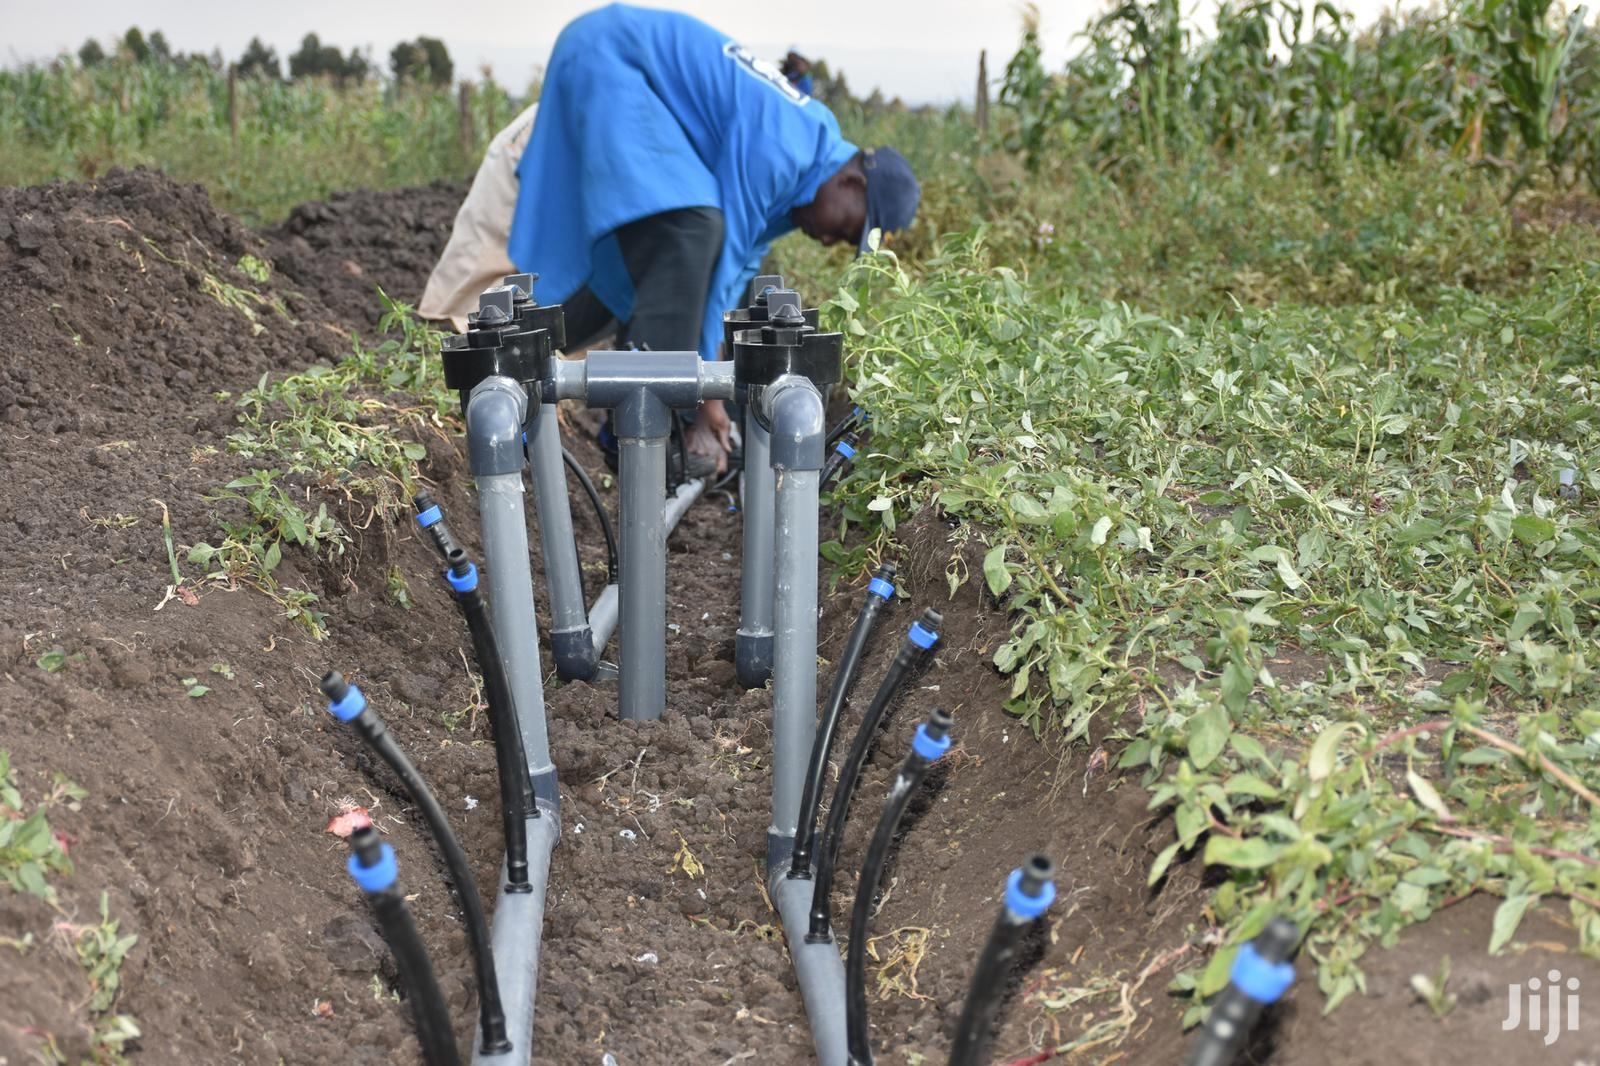 Affordable Drip Irrigation Kits For Eighth 1/8 Acre Plots/Farms   Farm Machinery & Equipment for sale in Langas, Uasin Gishu, Kenya